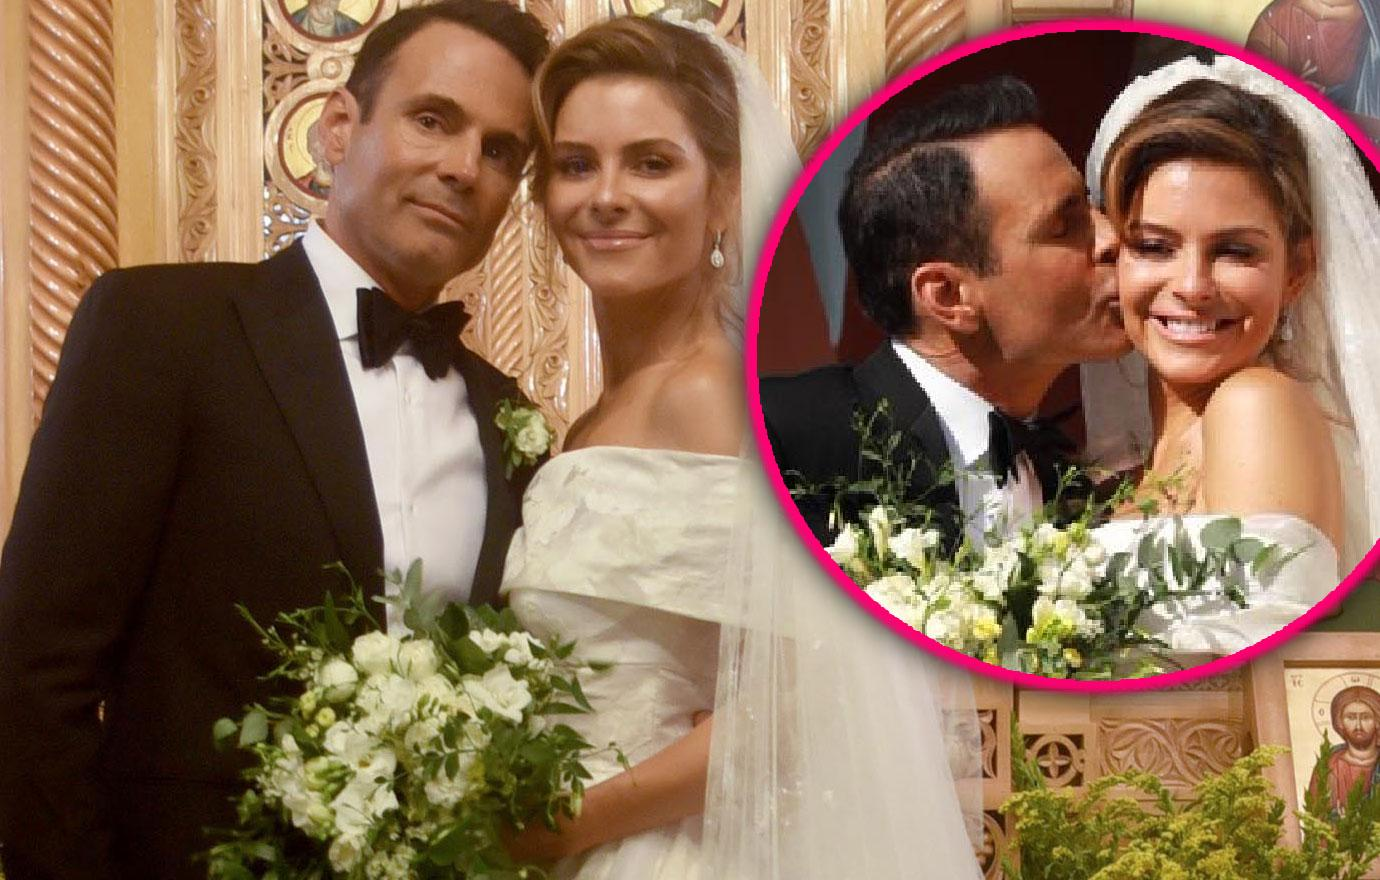 Maria Menounos And Keven Undergaro Have Traditional Greek Wedding